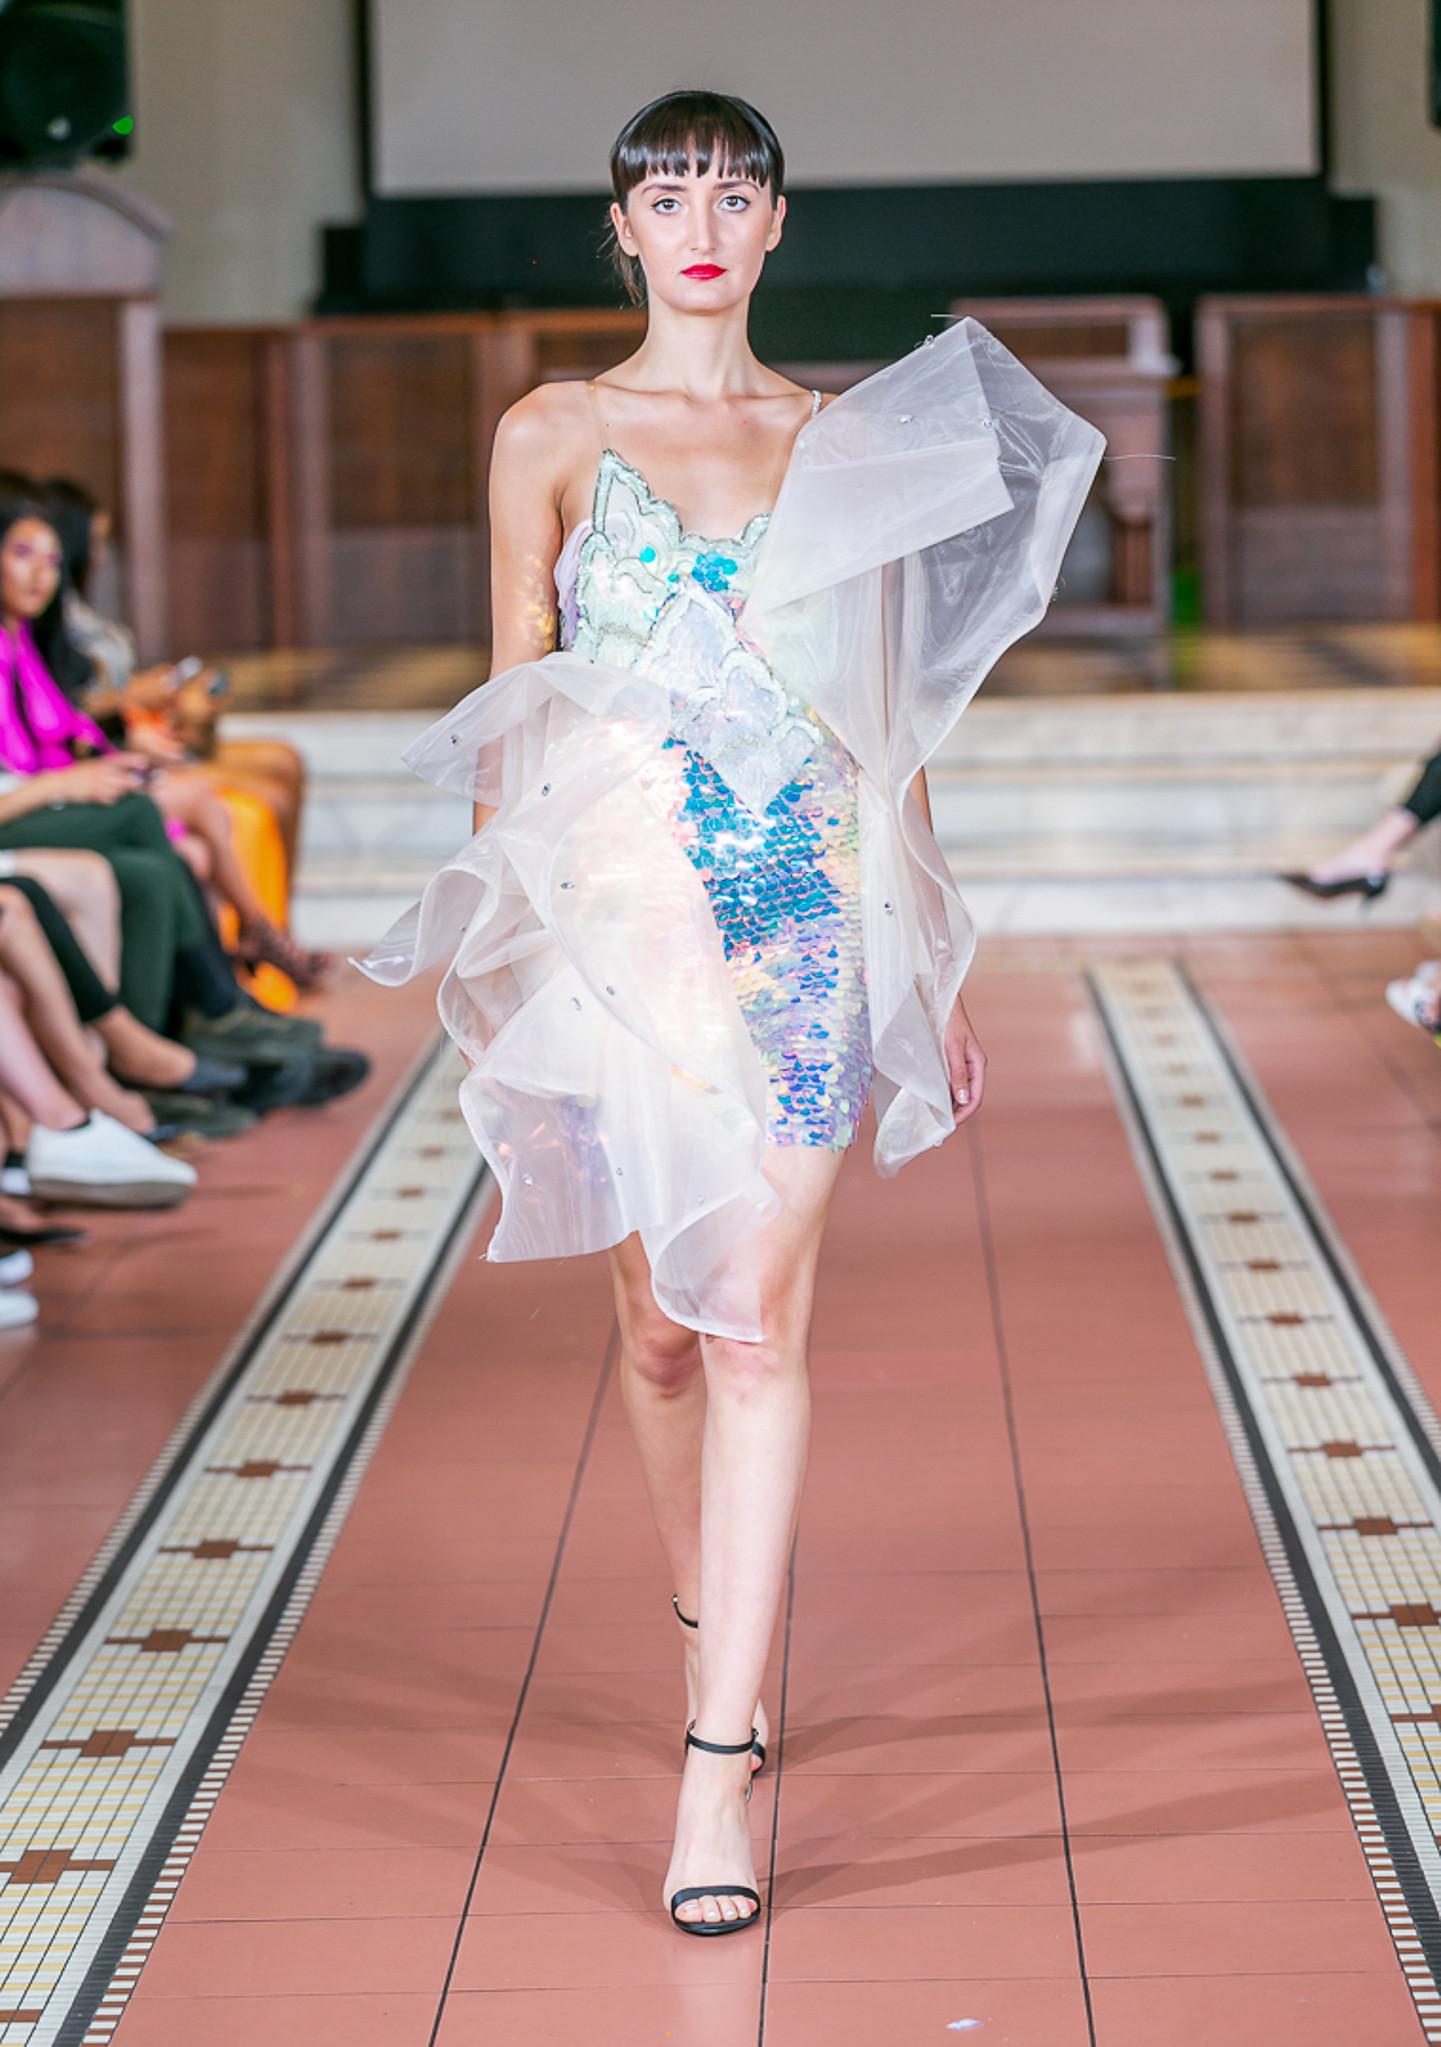 bree-billiter-gowns-fashion-sizzle-nyfw-2019